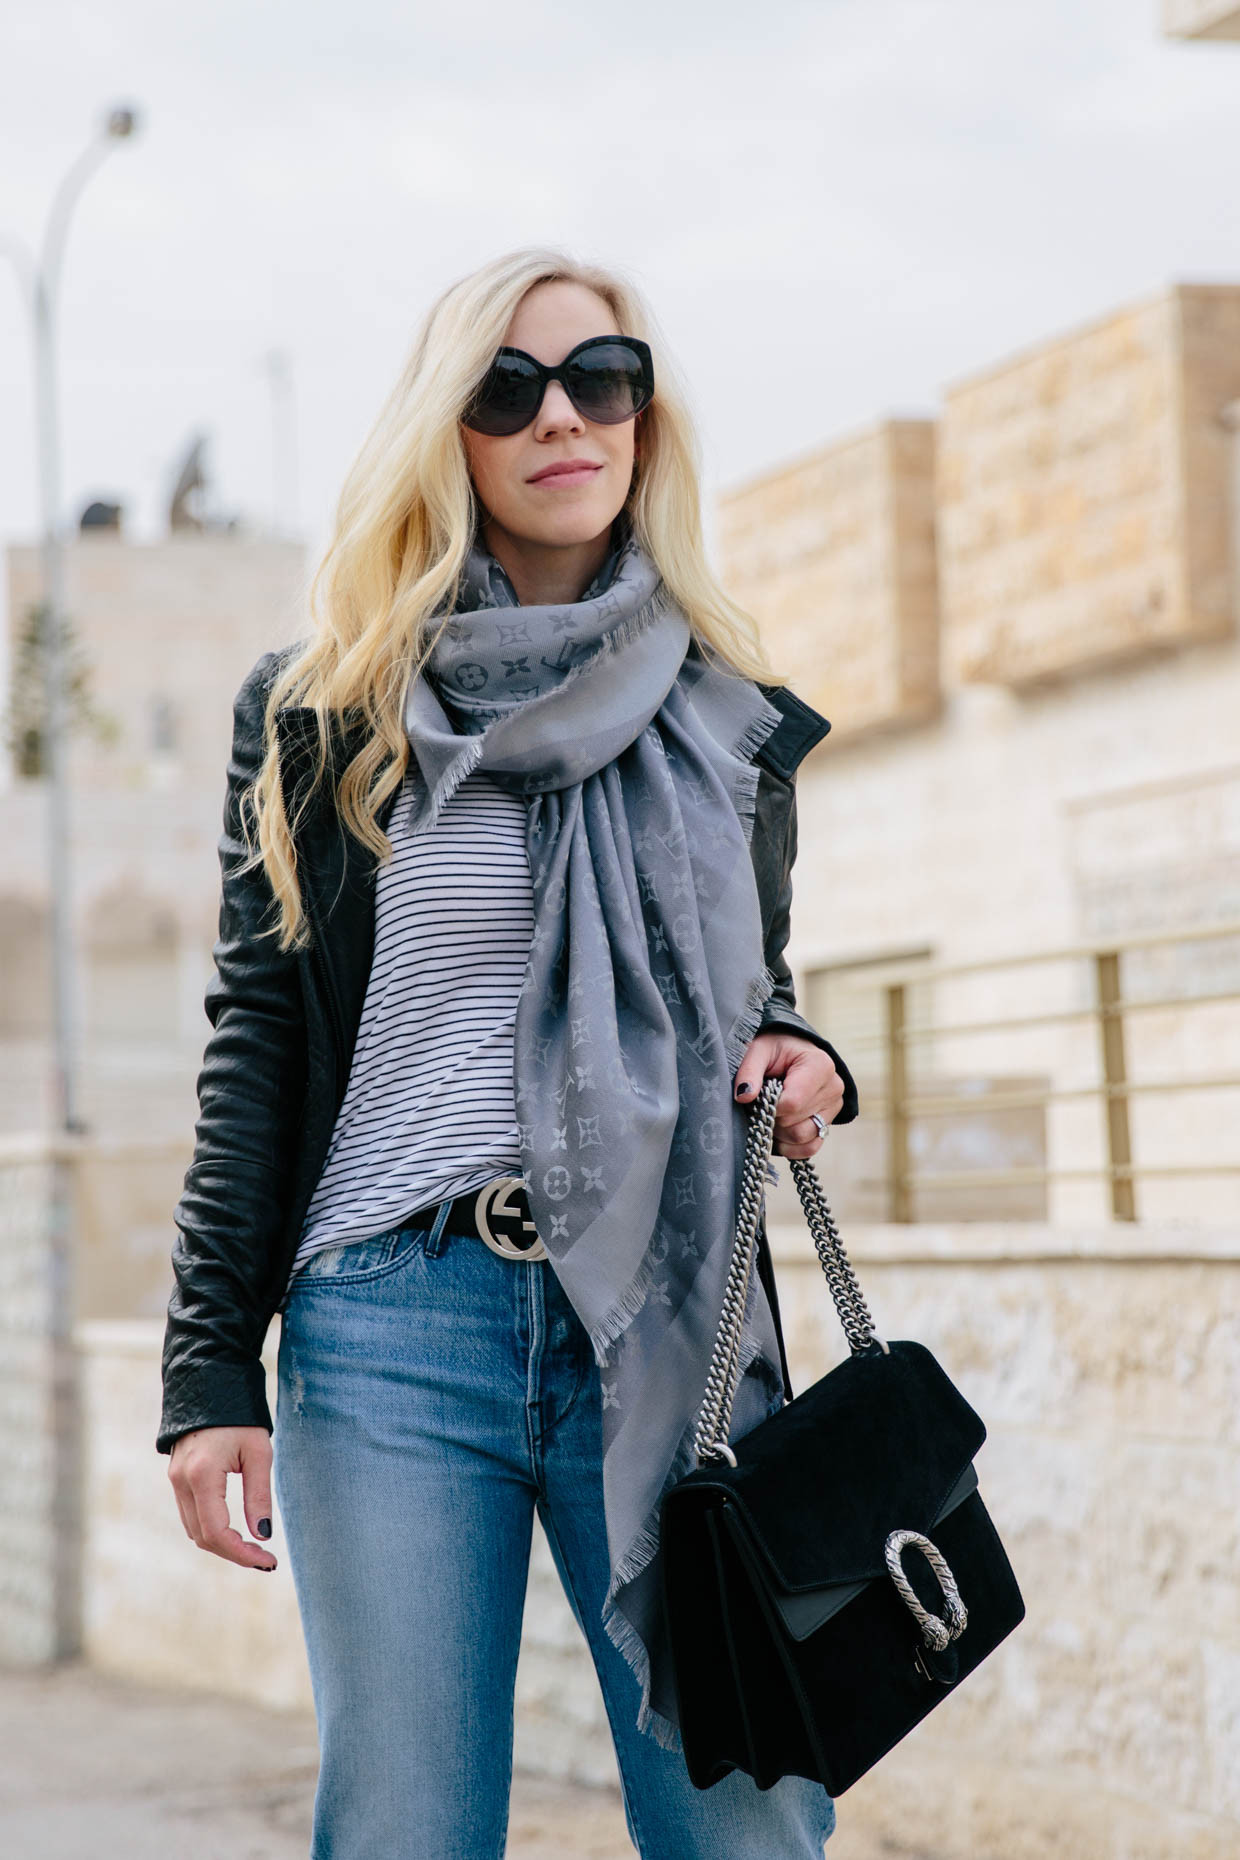 0cb9ae2da10 Meagan Brandon fashion blogger of Meagan s Moda wears black leather jacket  with striped tee